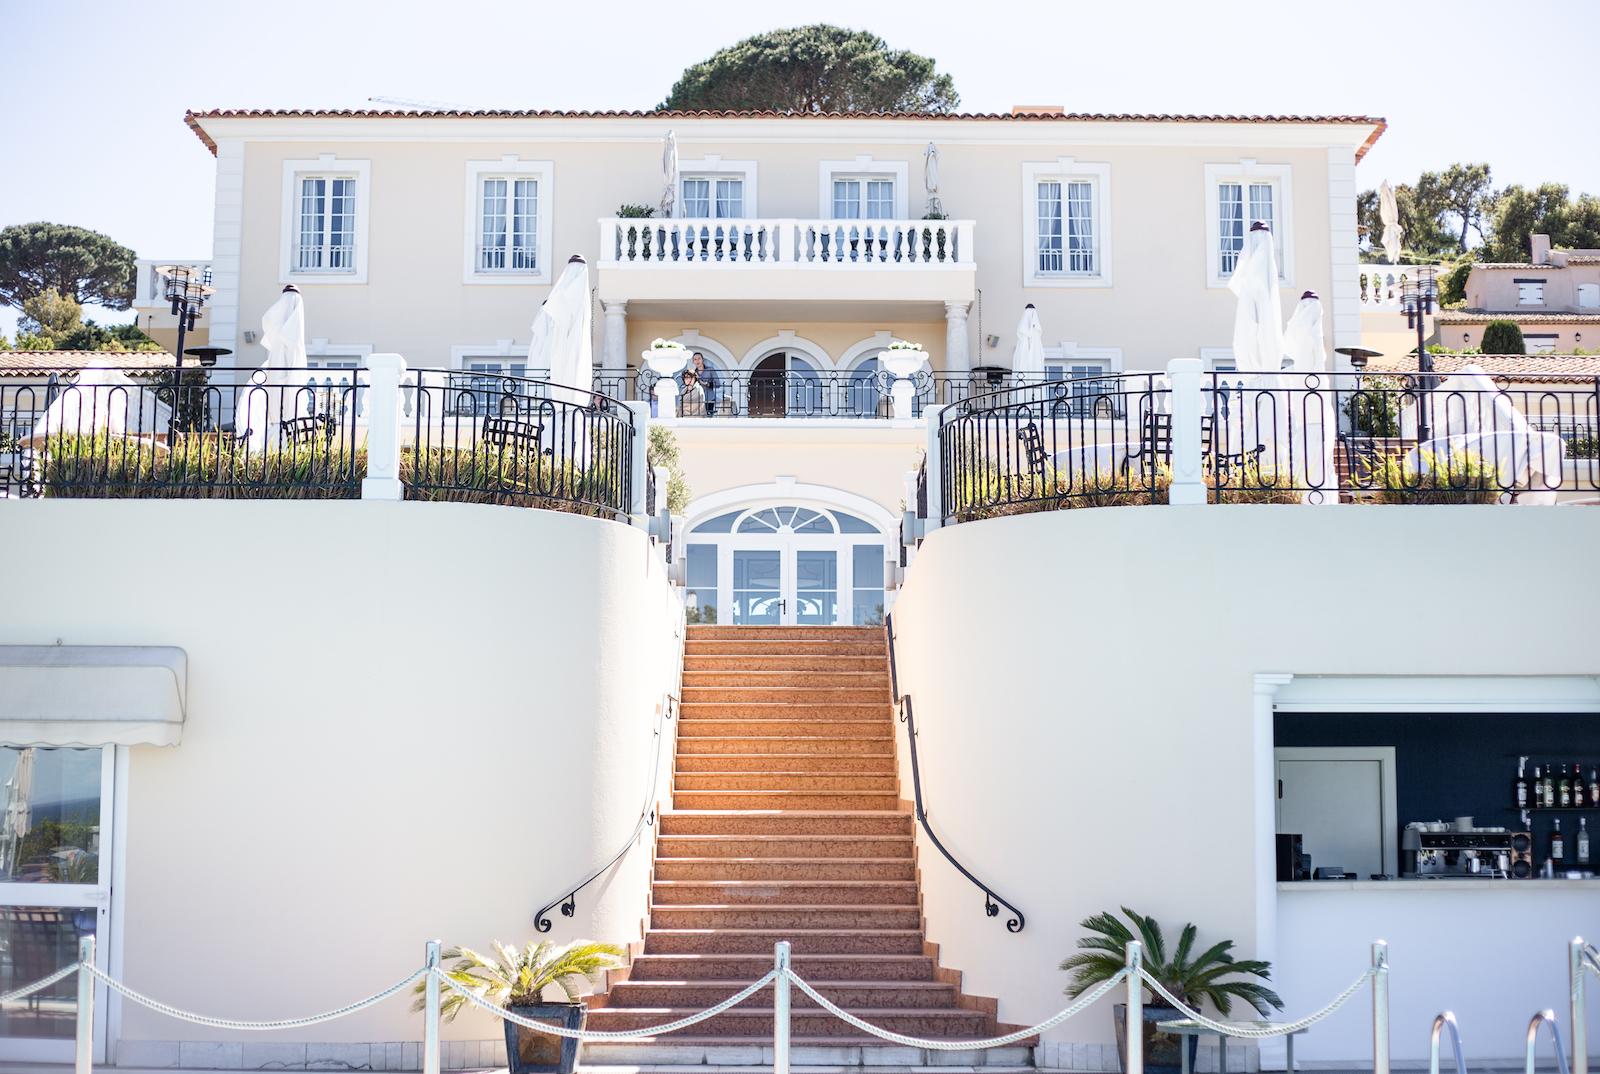 villa-belrose-althoff-hotel-st-tropez-livia-auer-IMG_5890